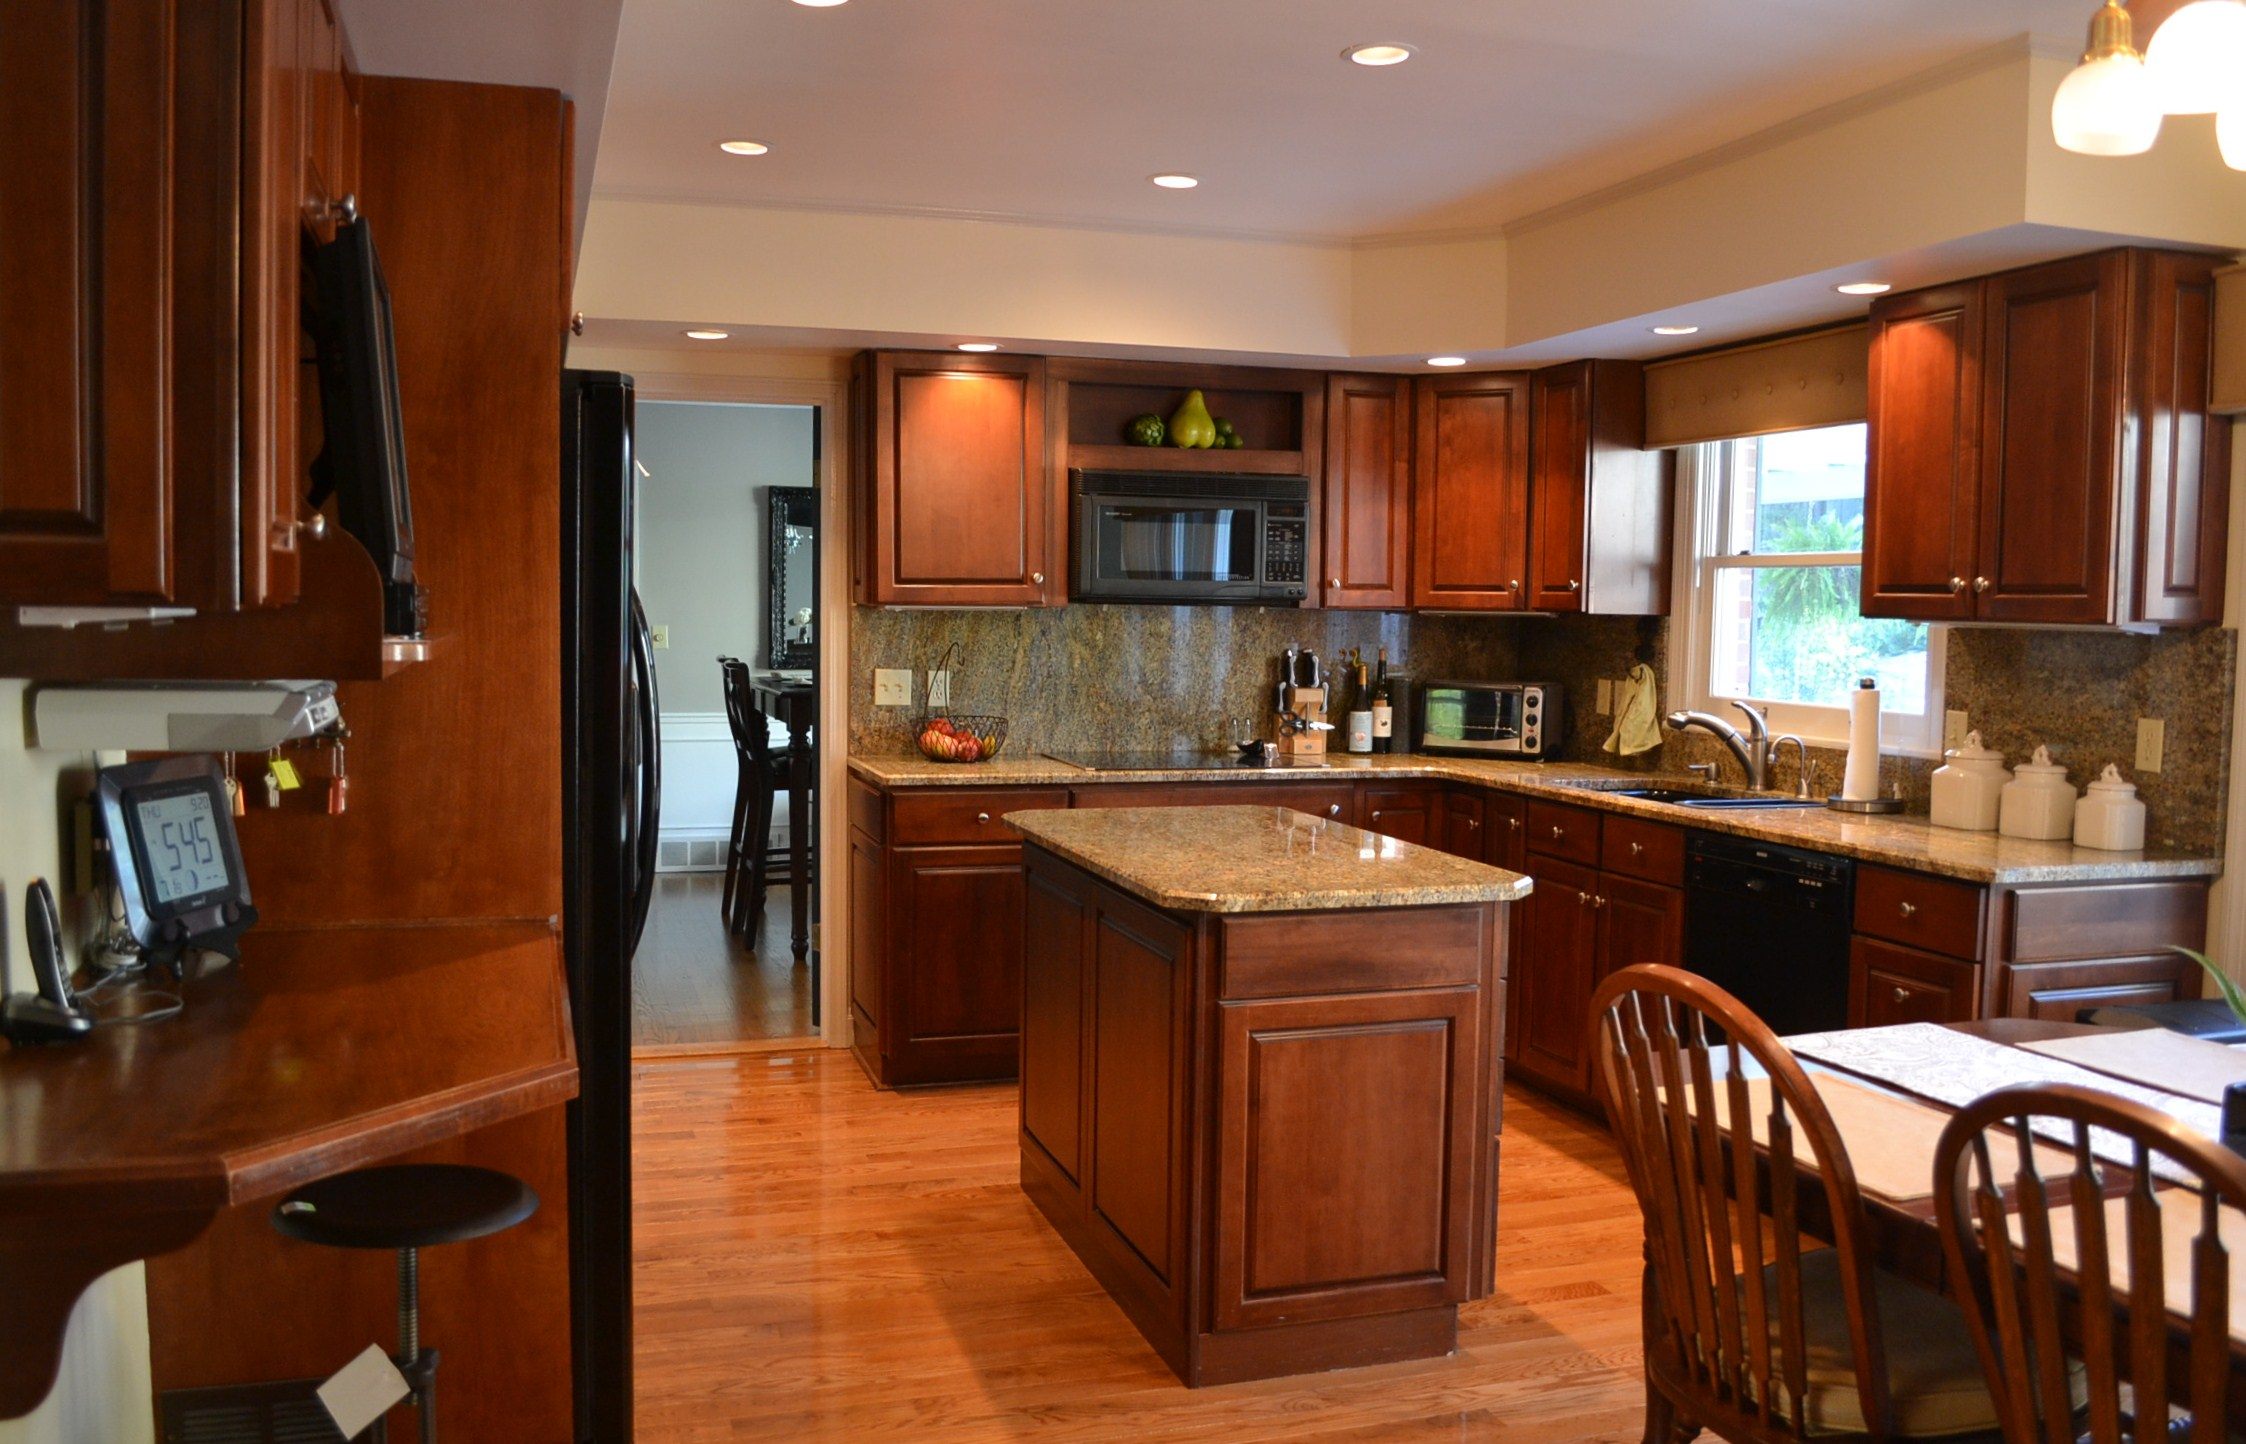 Kitchen Cabinet Treatments